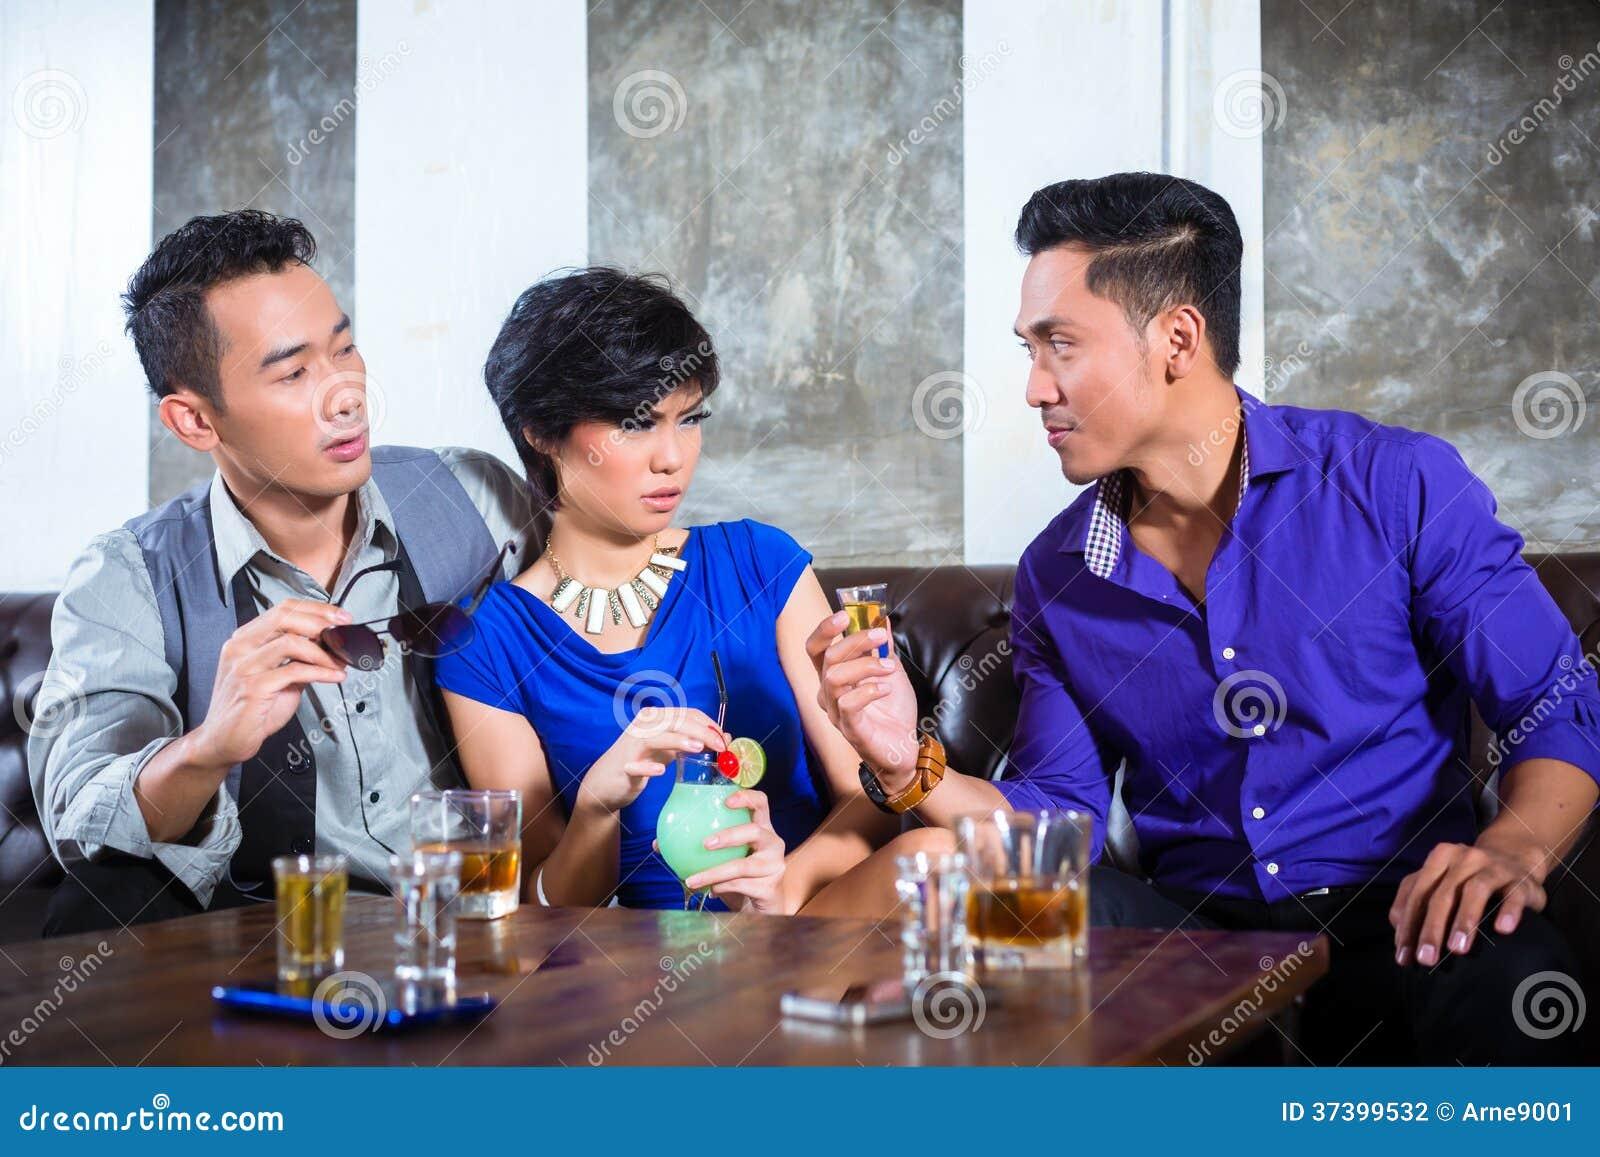 Women Harassing Men